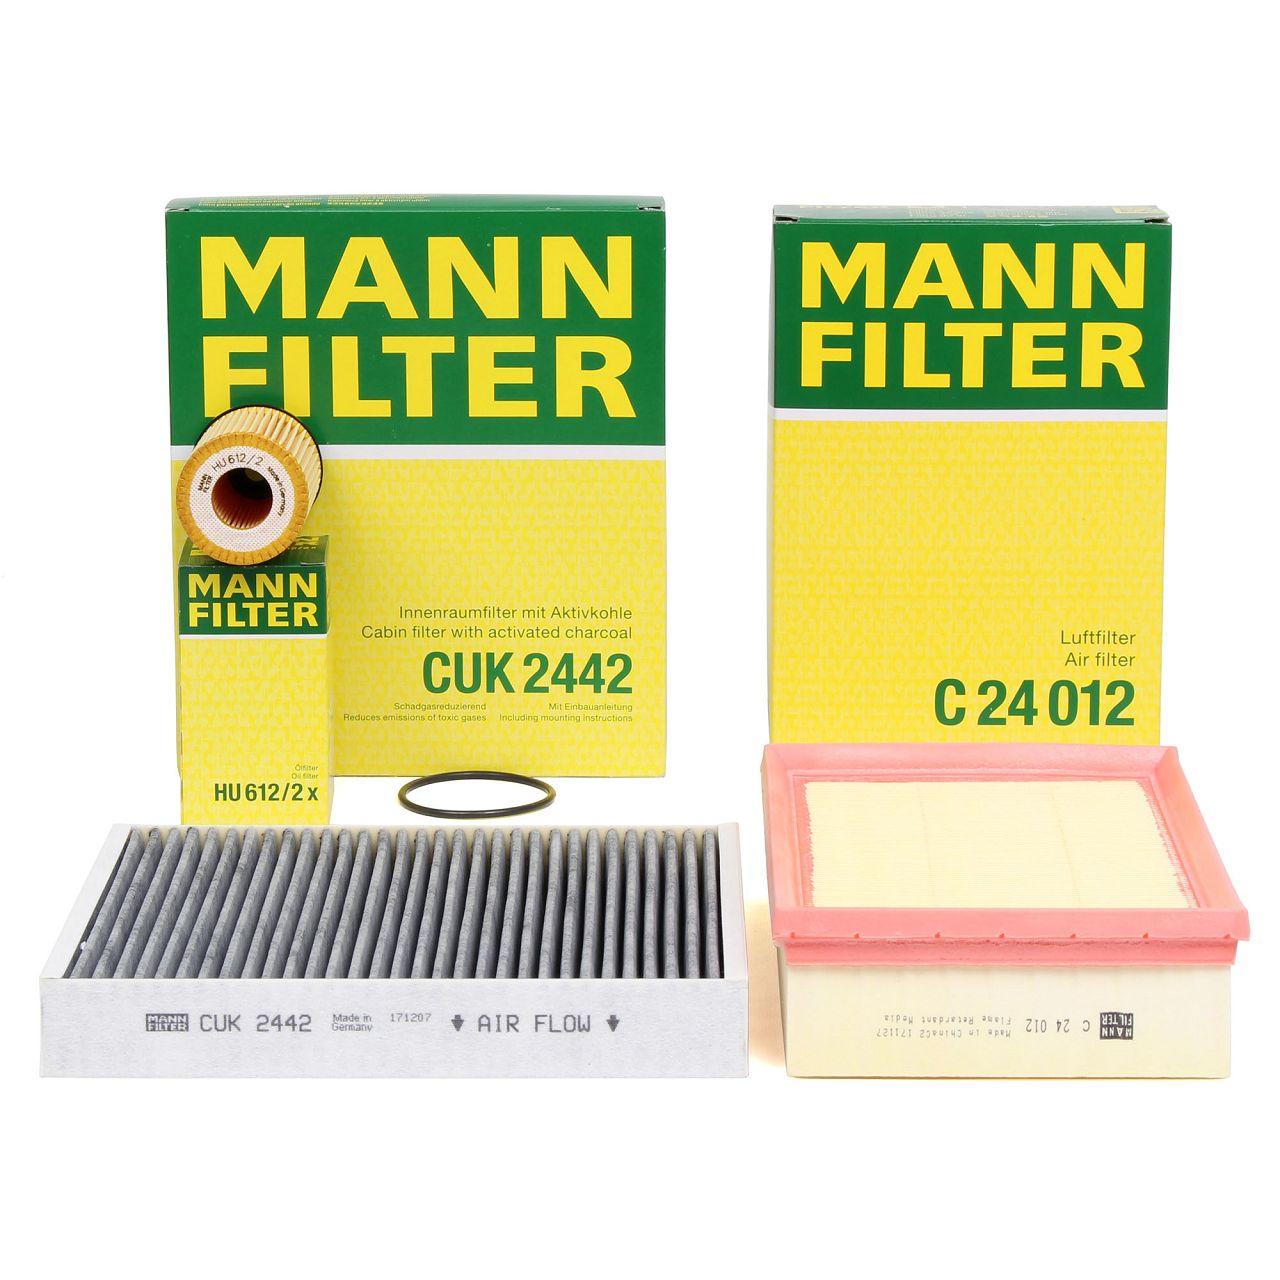 MANN Inspektionskit für CHEVROLET TRAX 1.4 1.6 1.8 OPEL MOKKA / MOKKA X 1.4 1.6